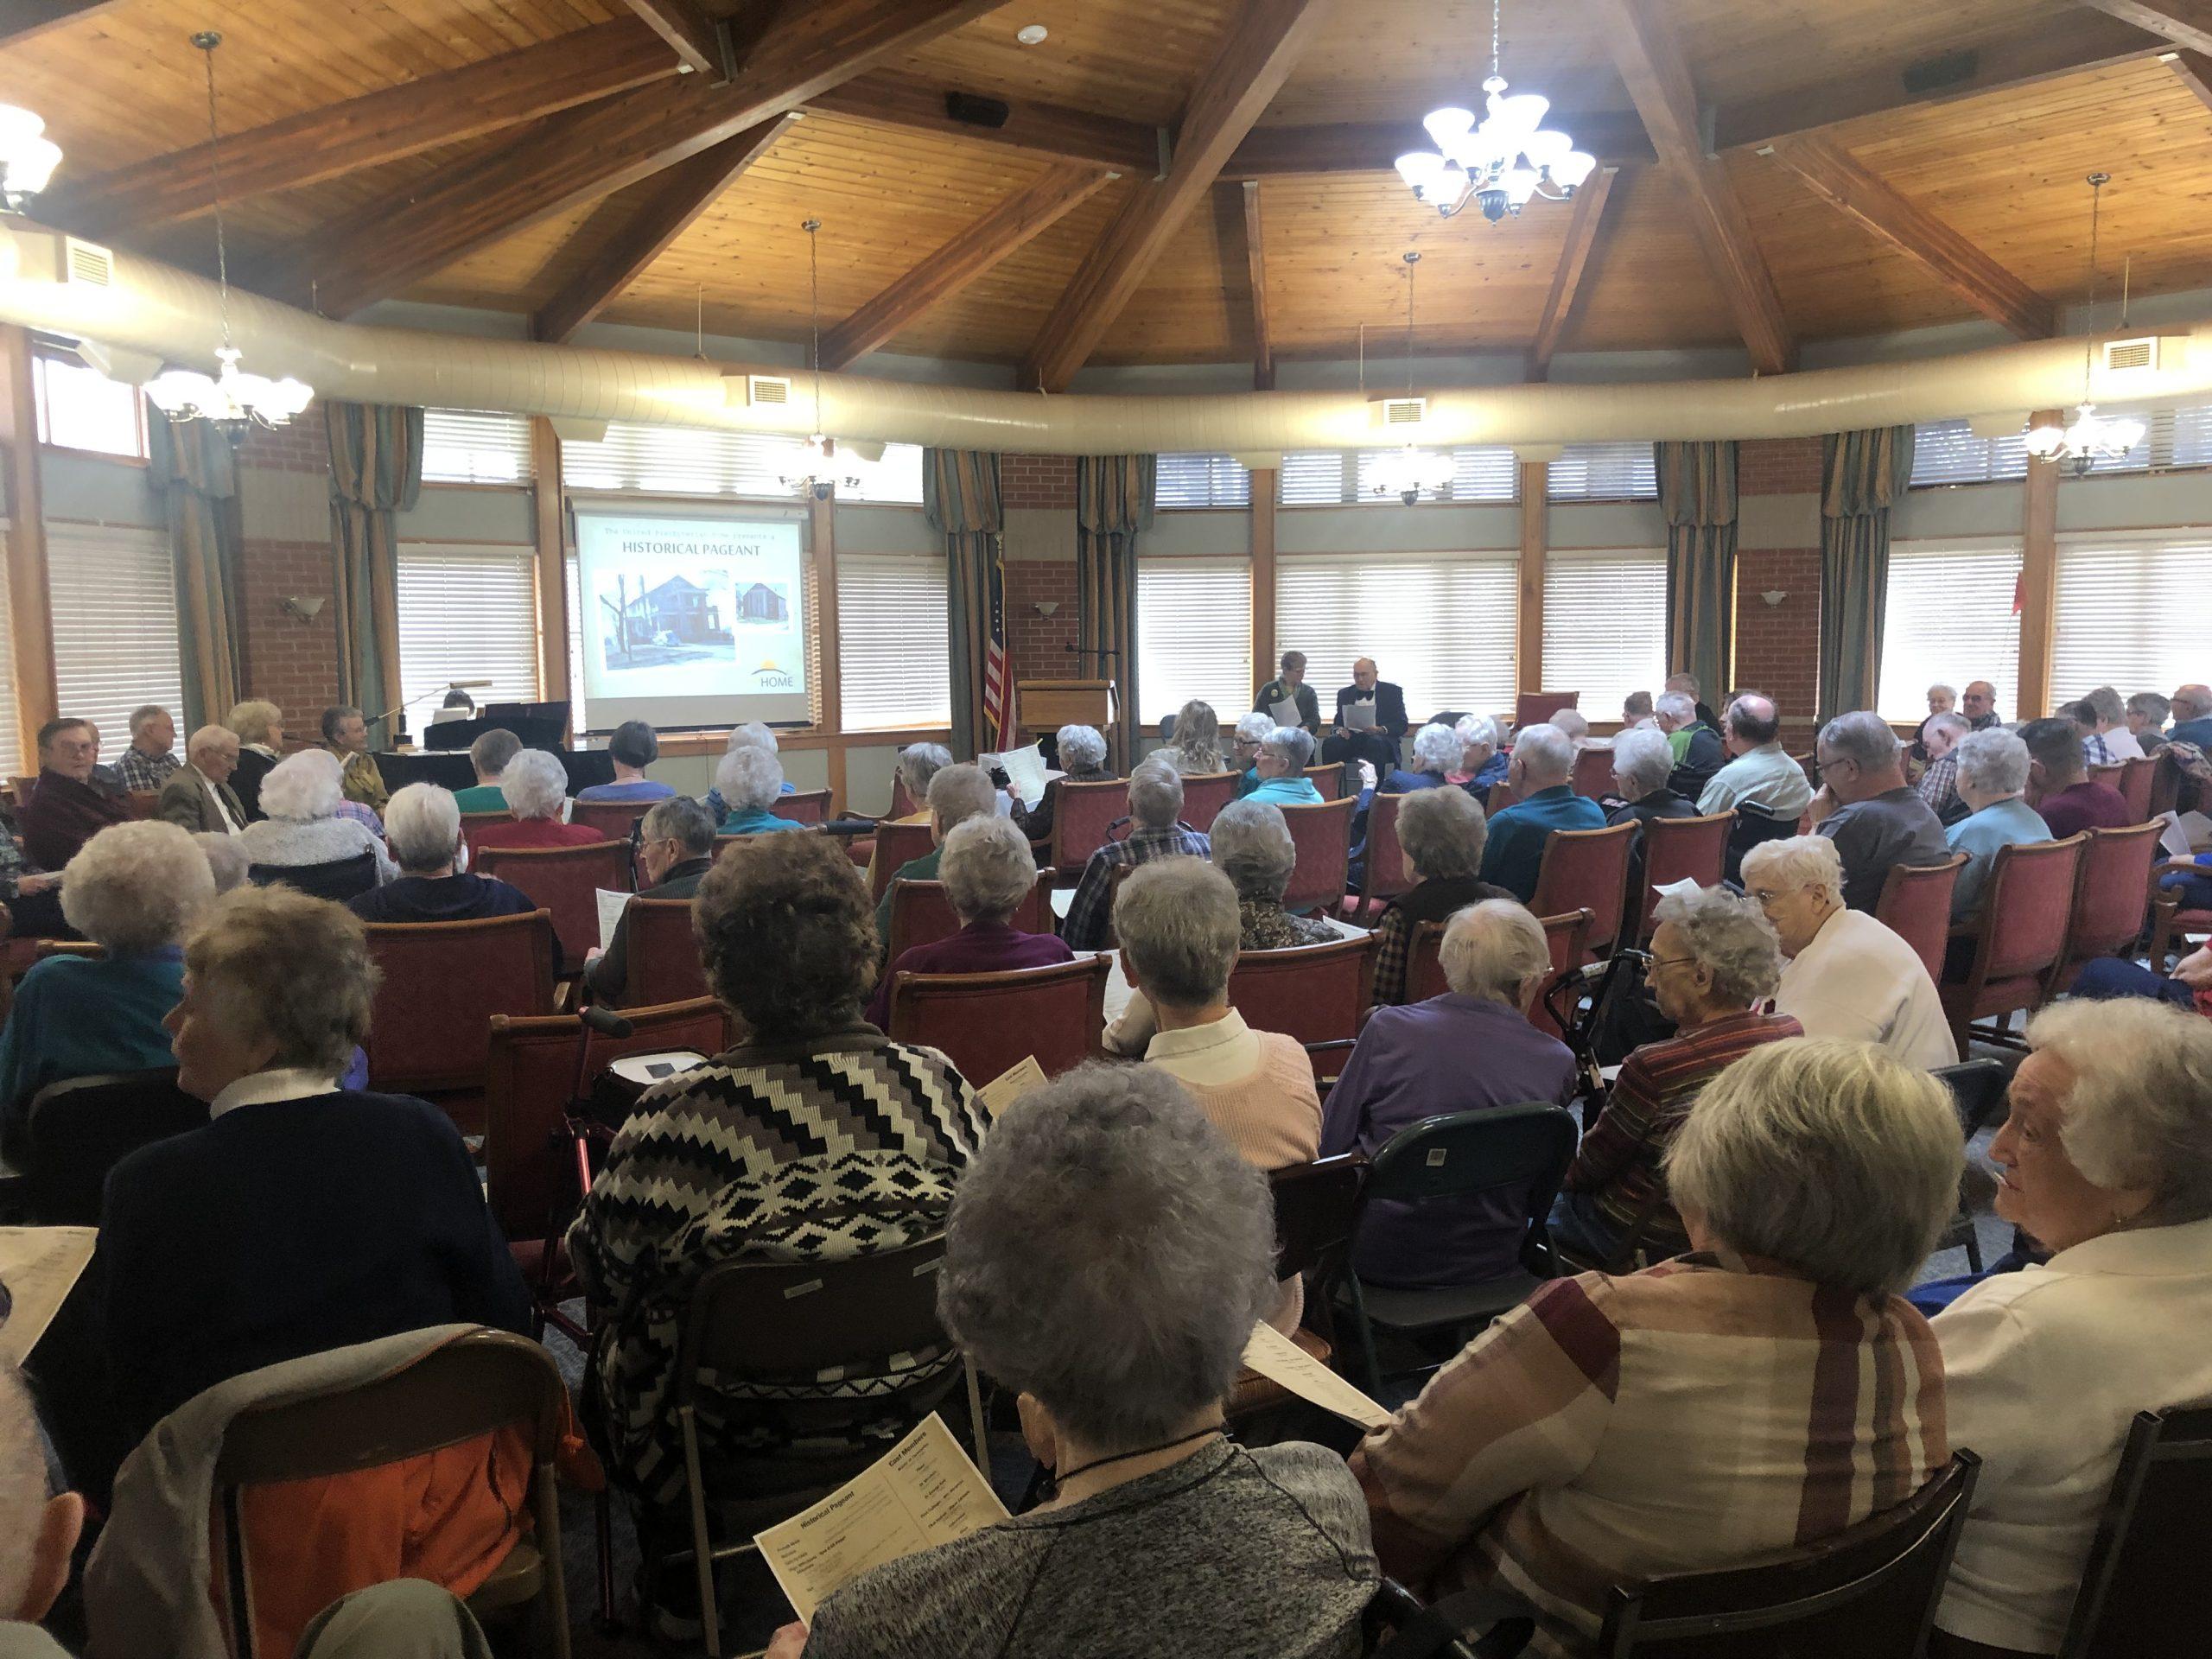 Community at United Presbyterian Home in Washington, Iowa